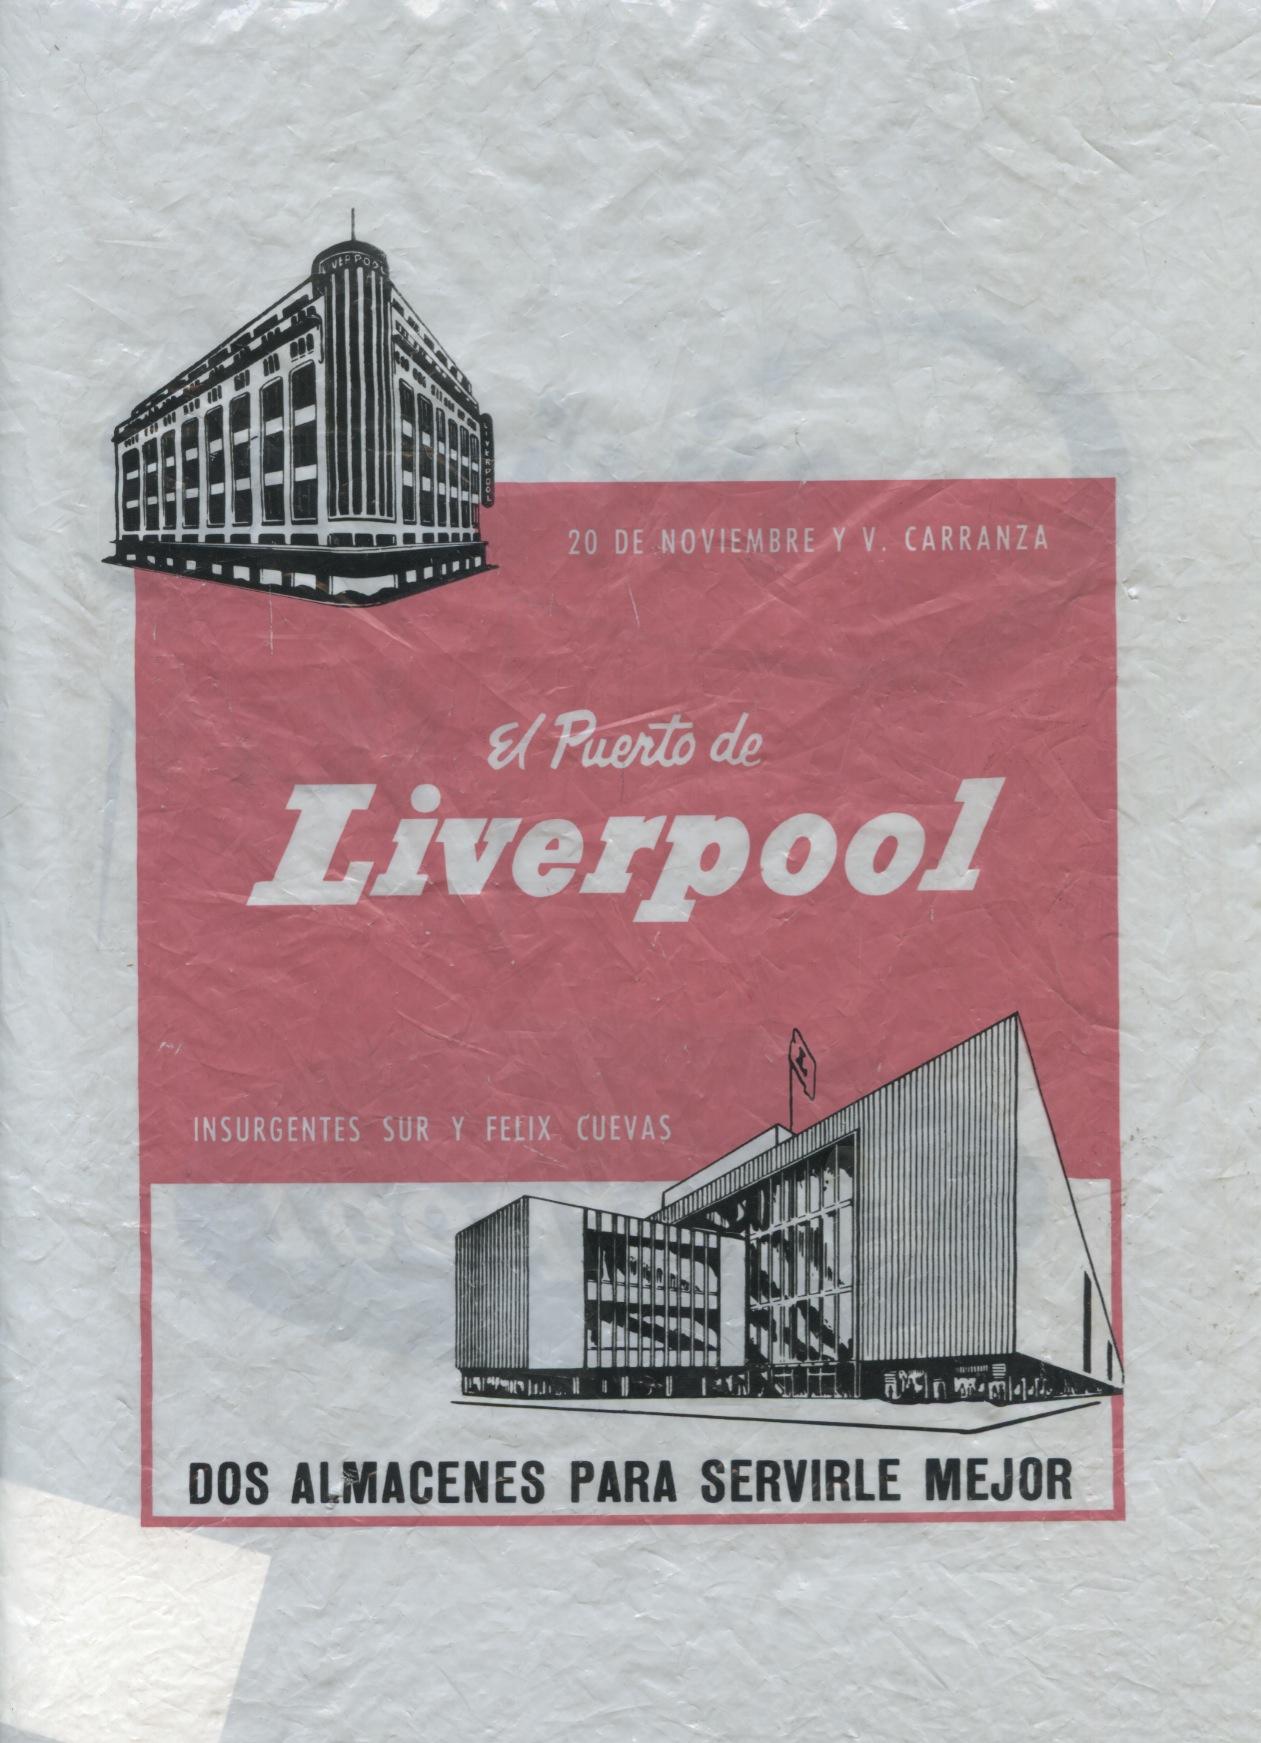 Vintage Liverpool Bag